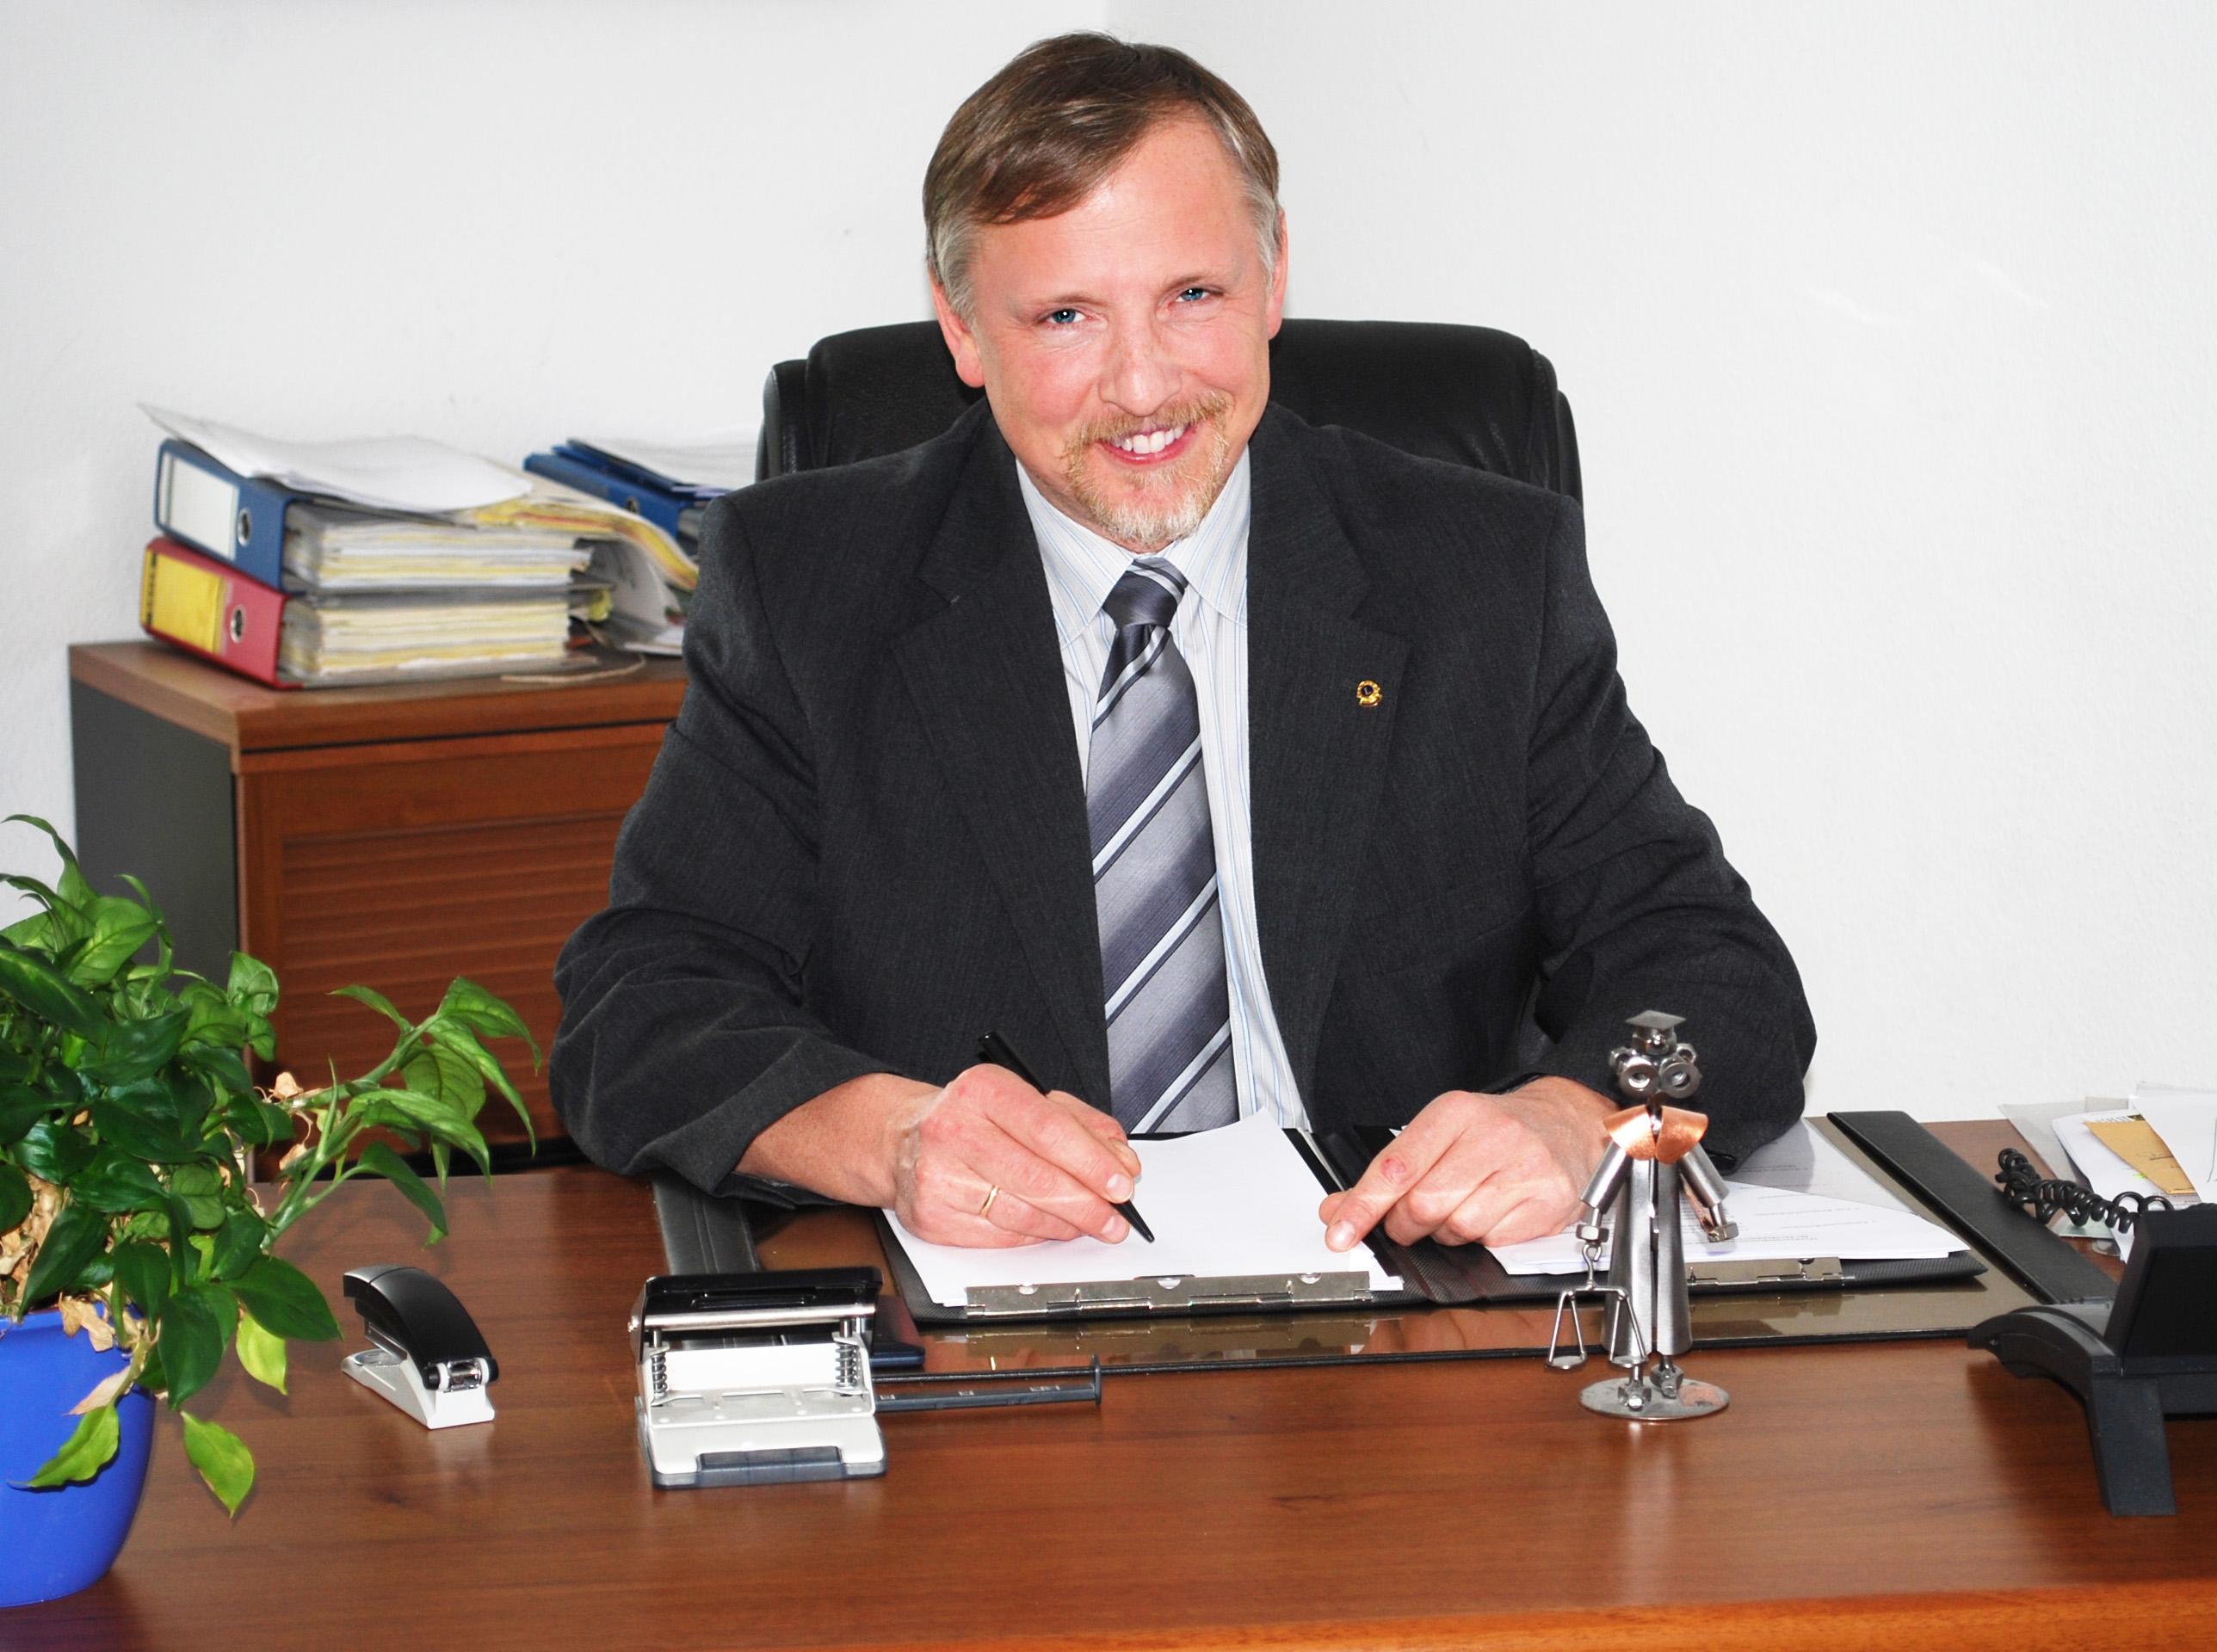 RA Frank Schwerdtner